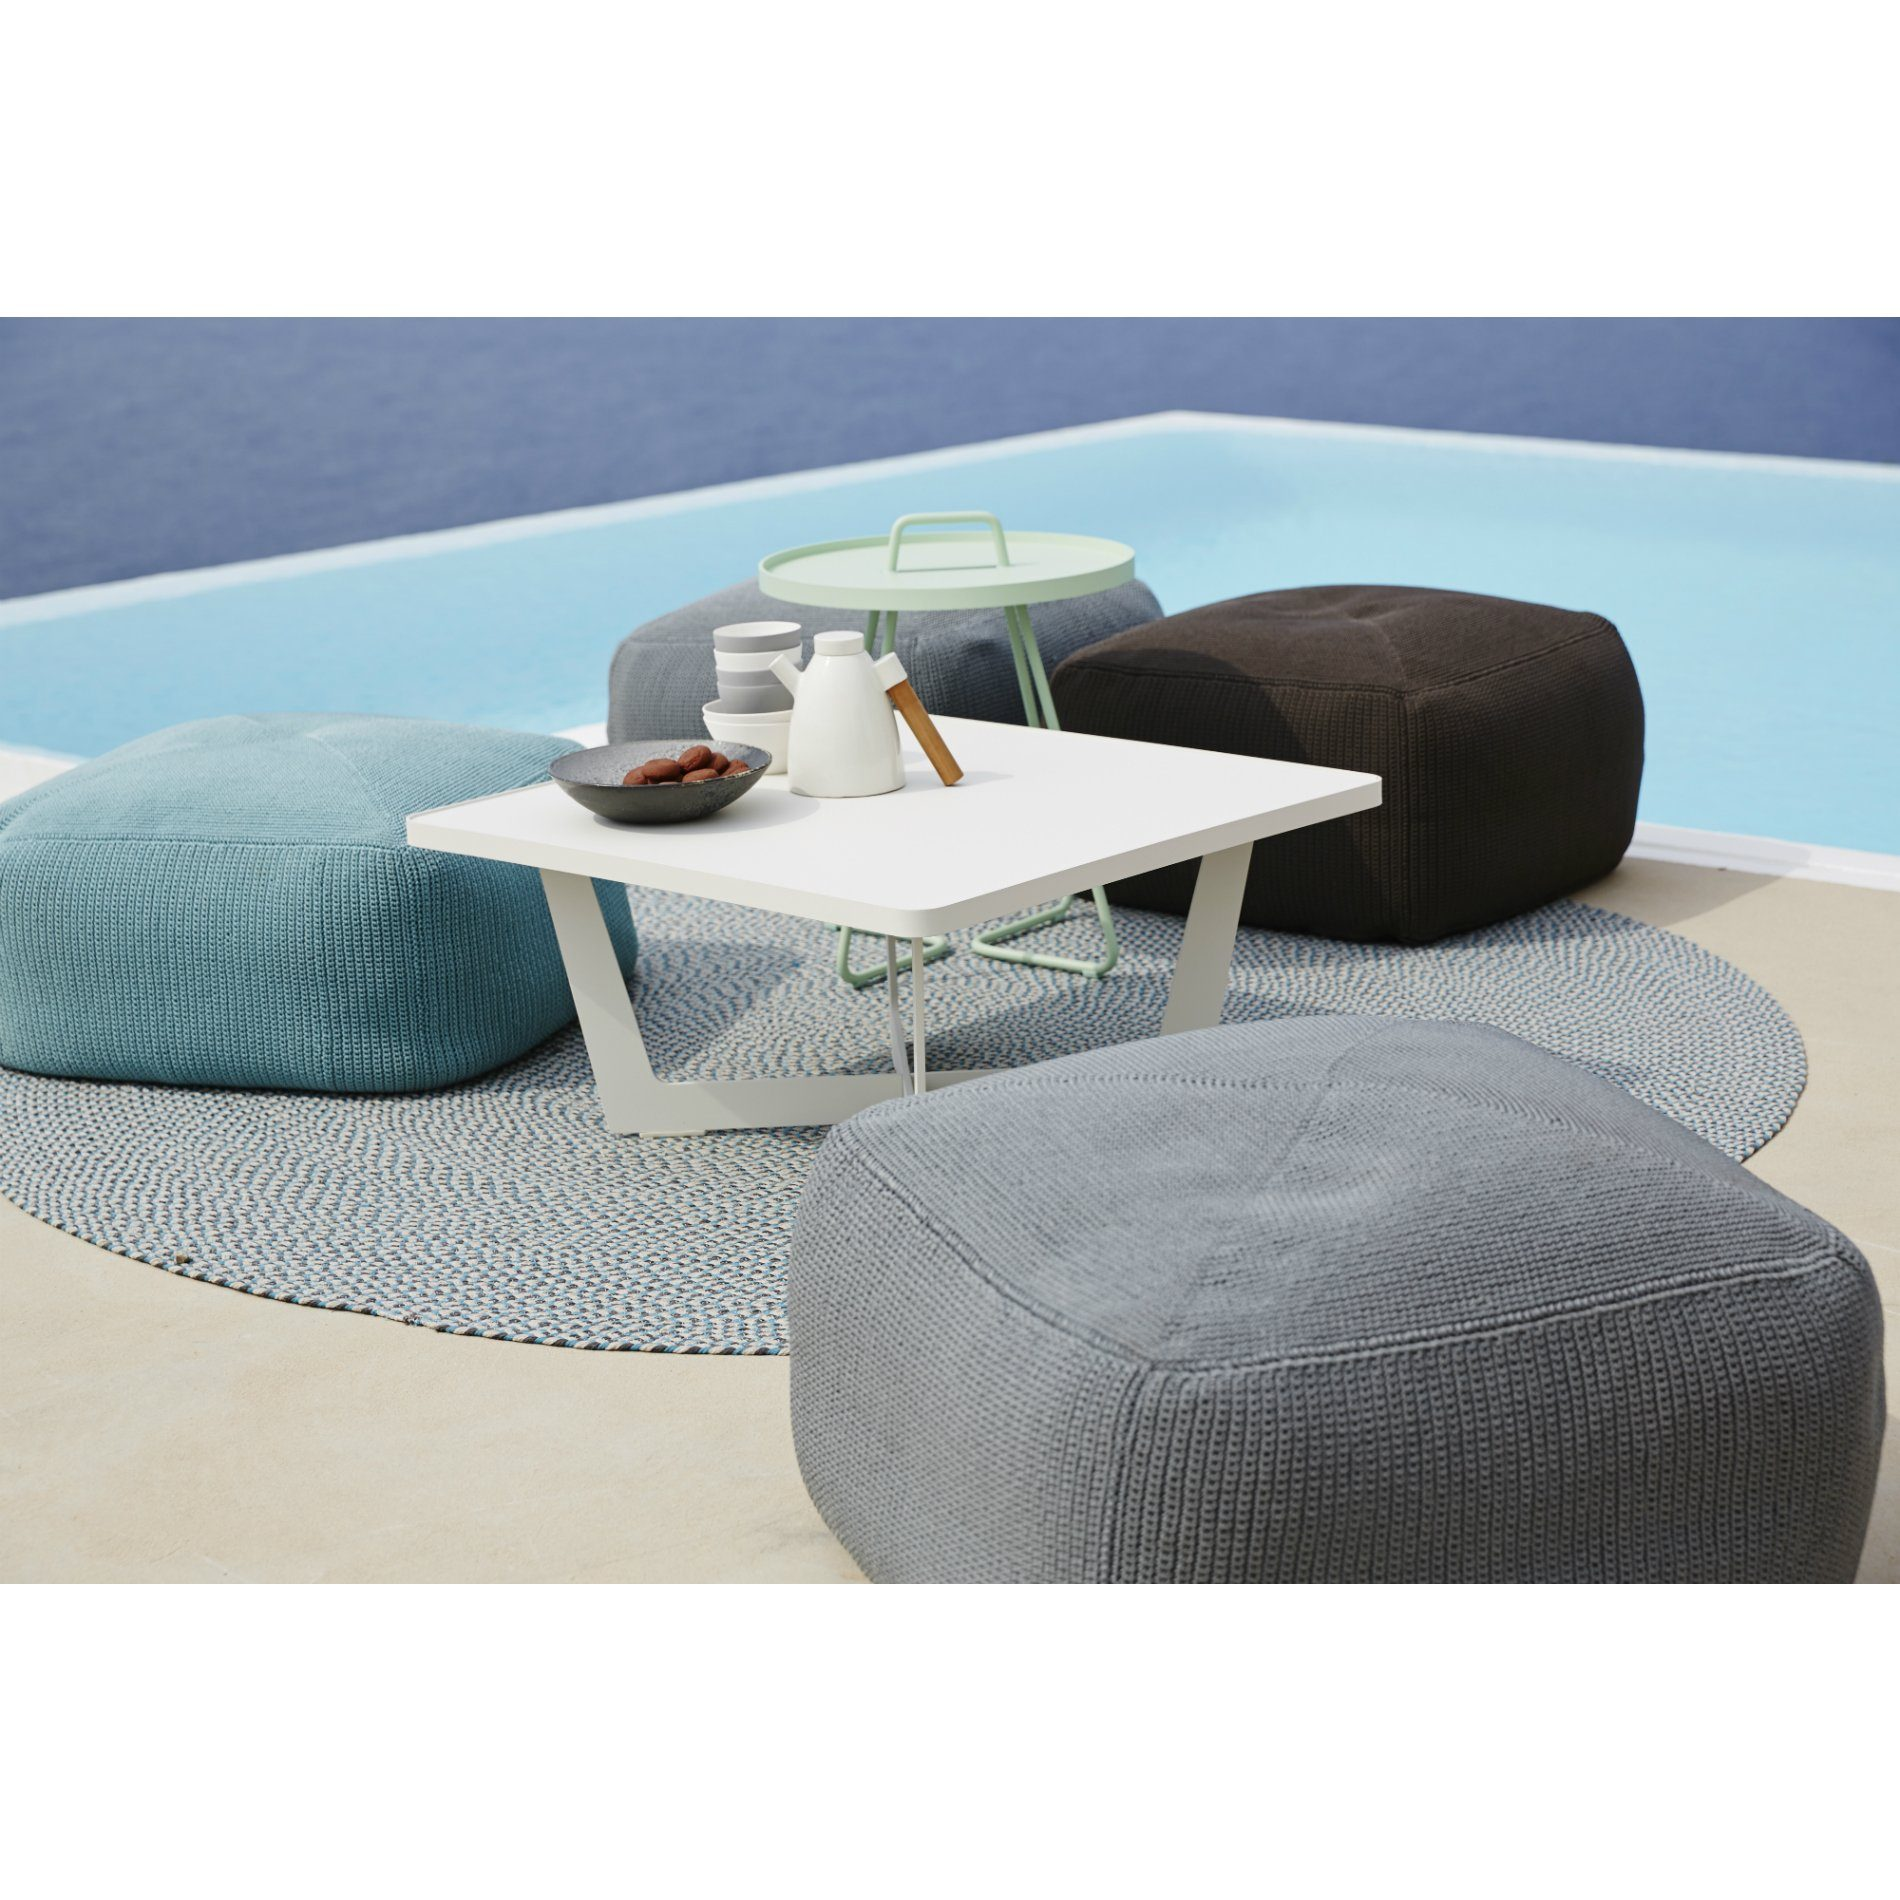 cane line outdoor teppich defined rund. Black Bedroom Furniture Sets. Home Design Ideas